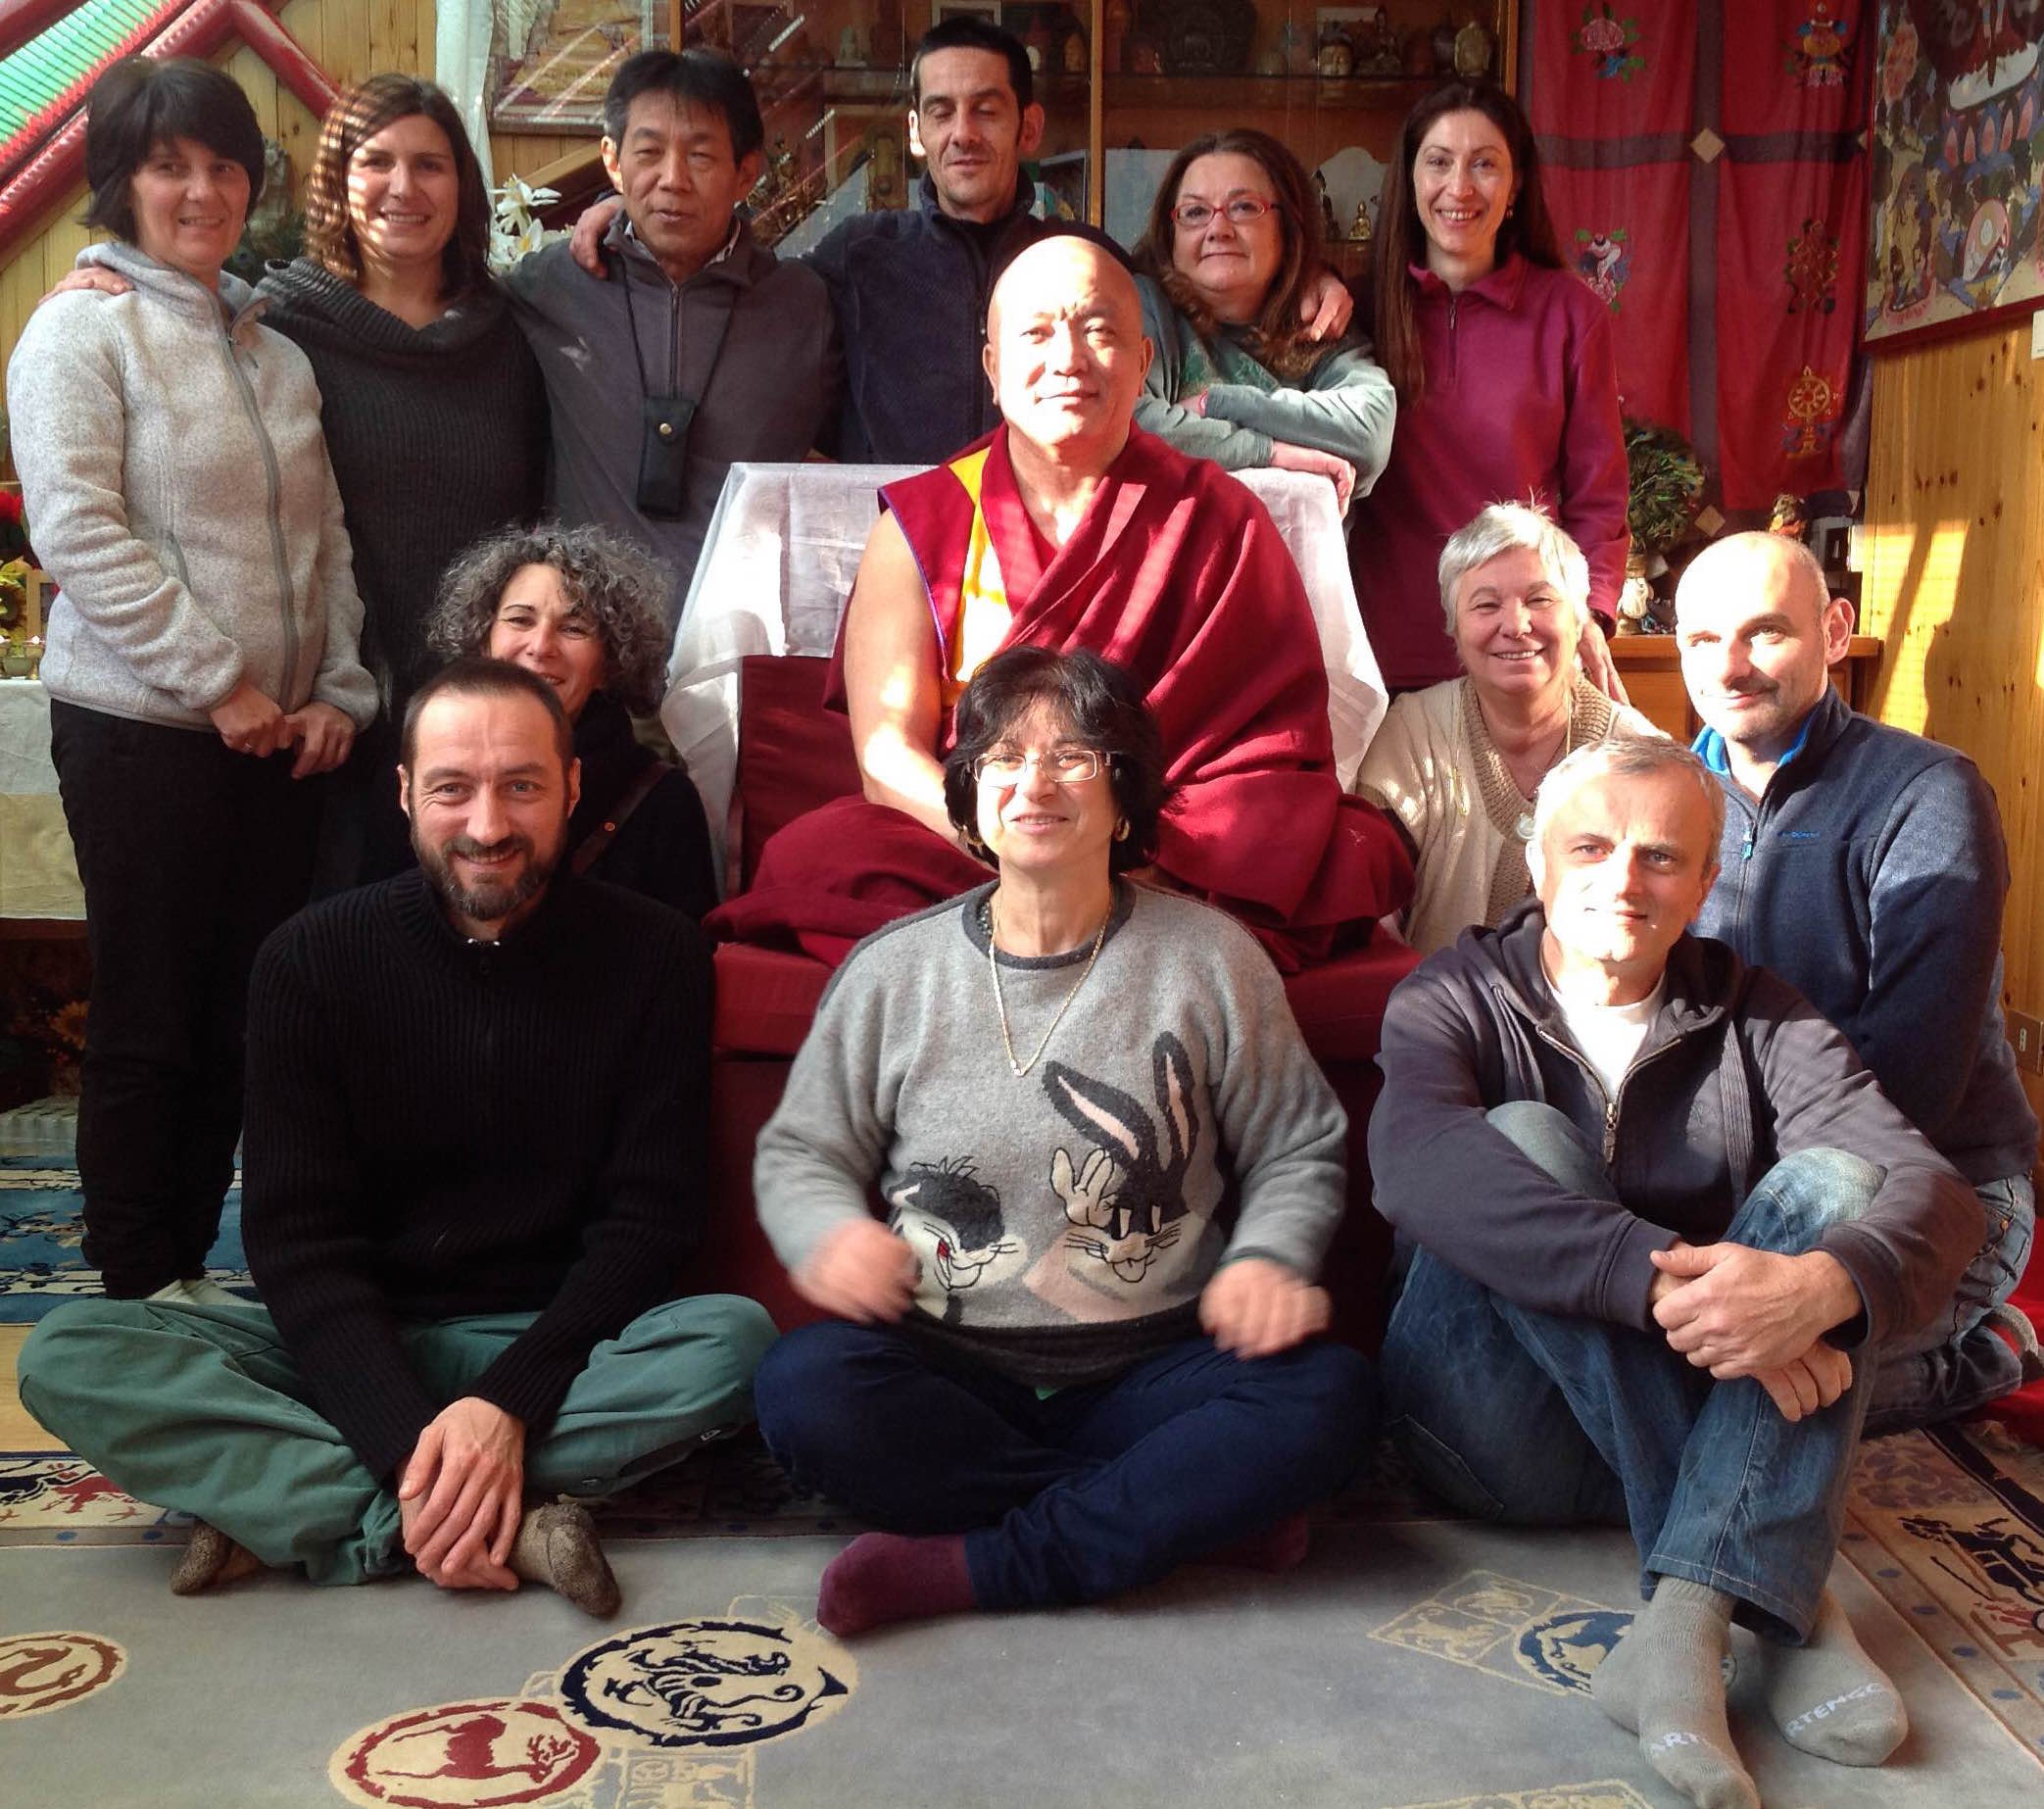 Il Ven. Ghesce Tenzin Tenphel al Centro Studi Tibetani Sangye Cioeling di Sondrio il 28-29.11.15